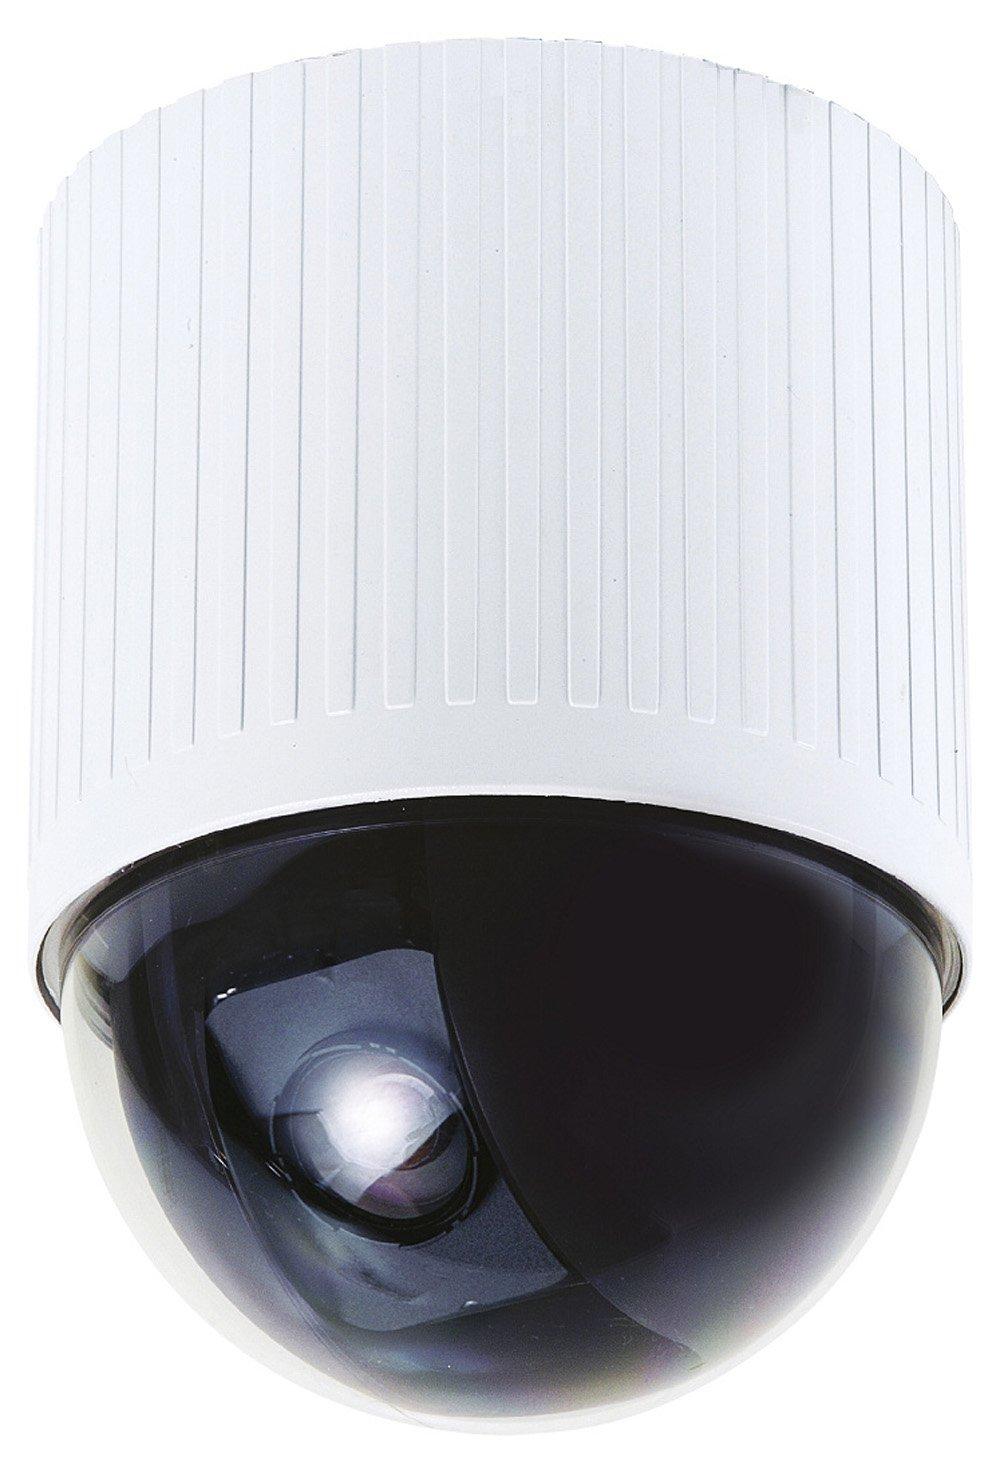 SPT 15-CD53-S223 23x Indoor Day/Night PTZ Camera 560TVL (White) by SPT